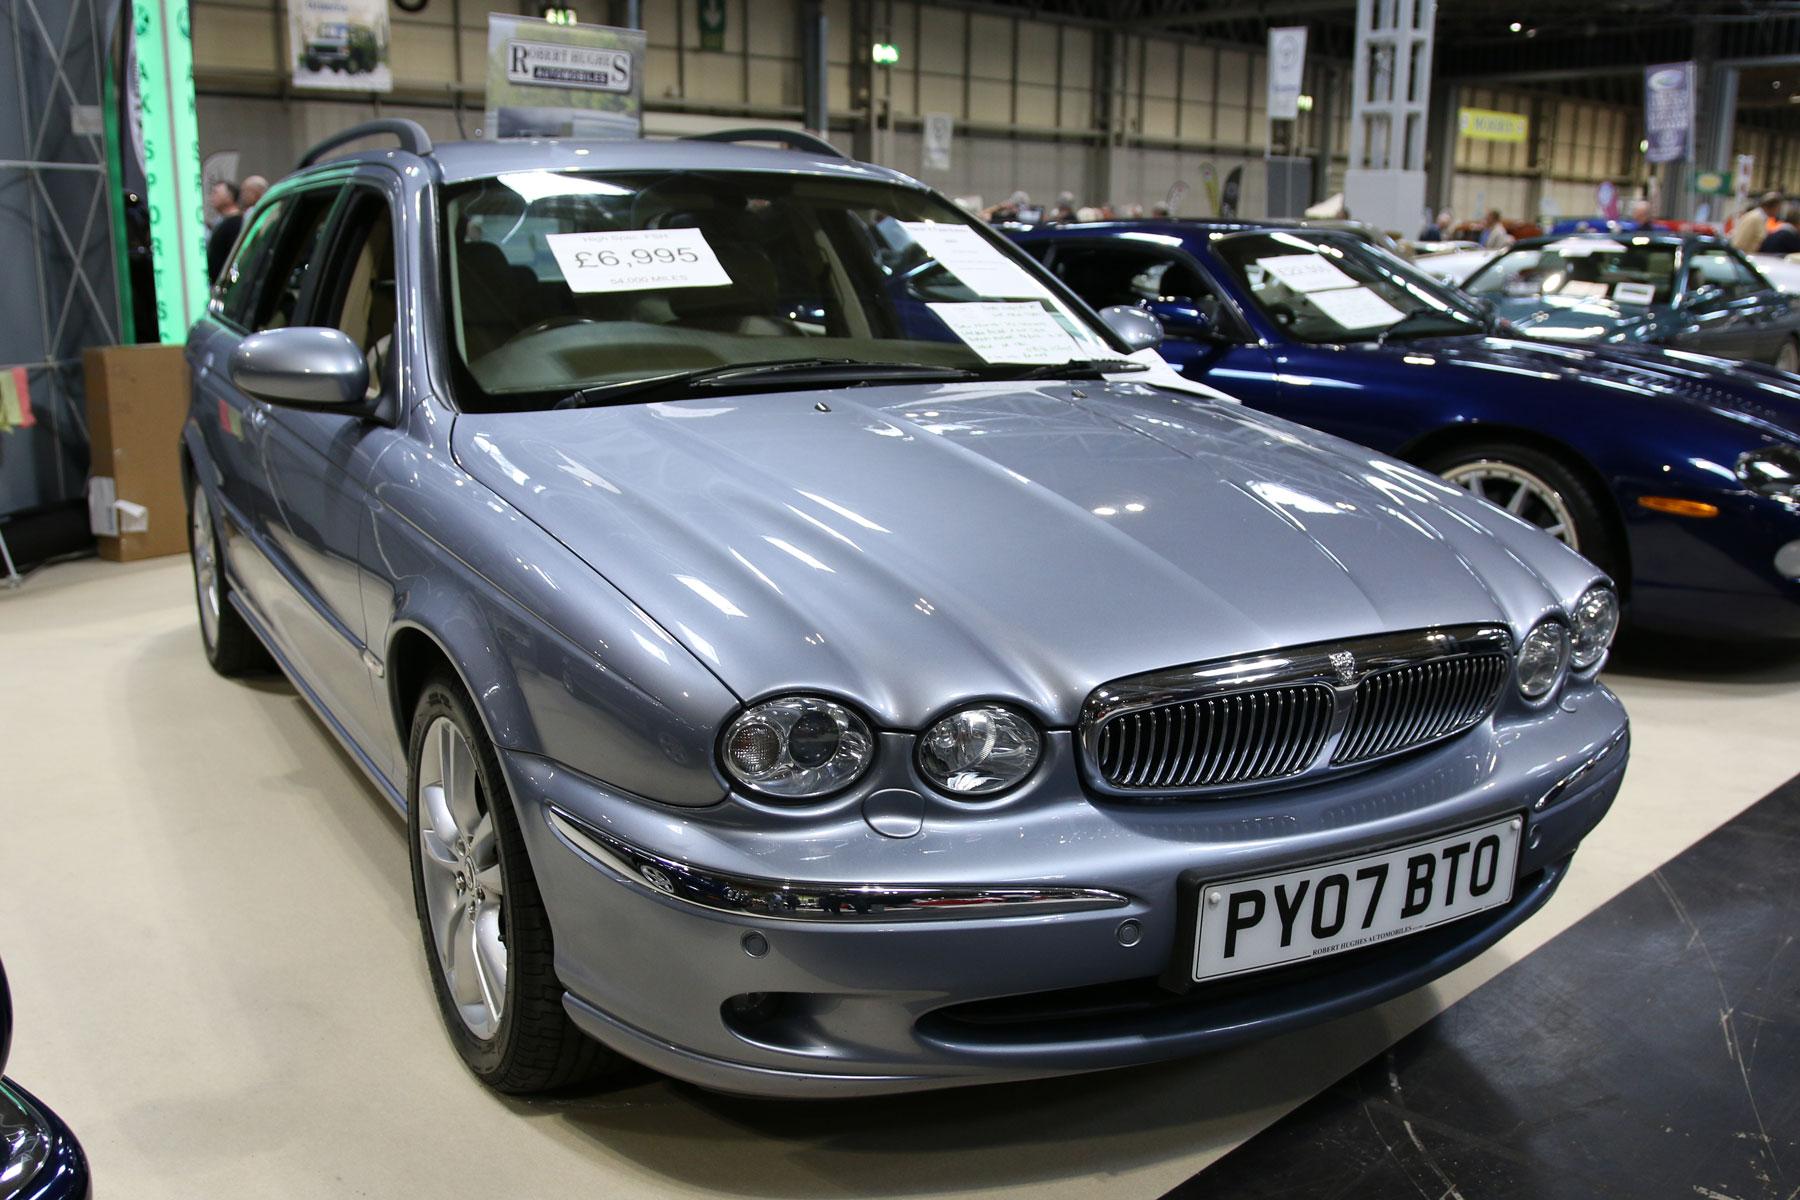 Jaguar X-Type: £6,995